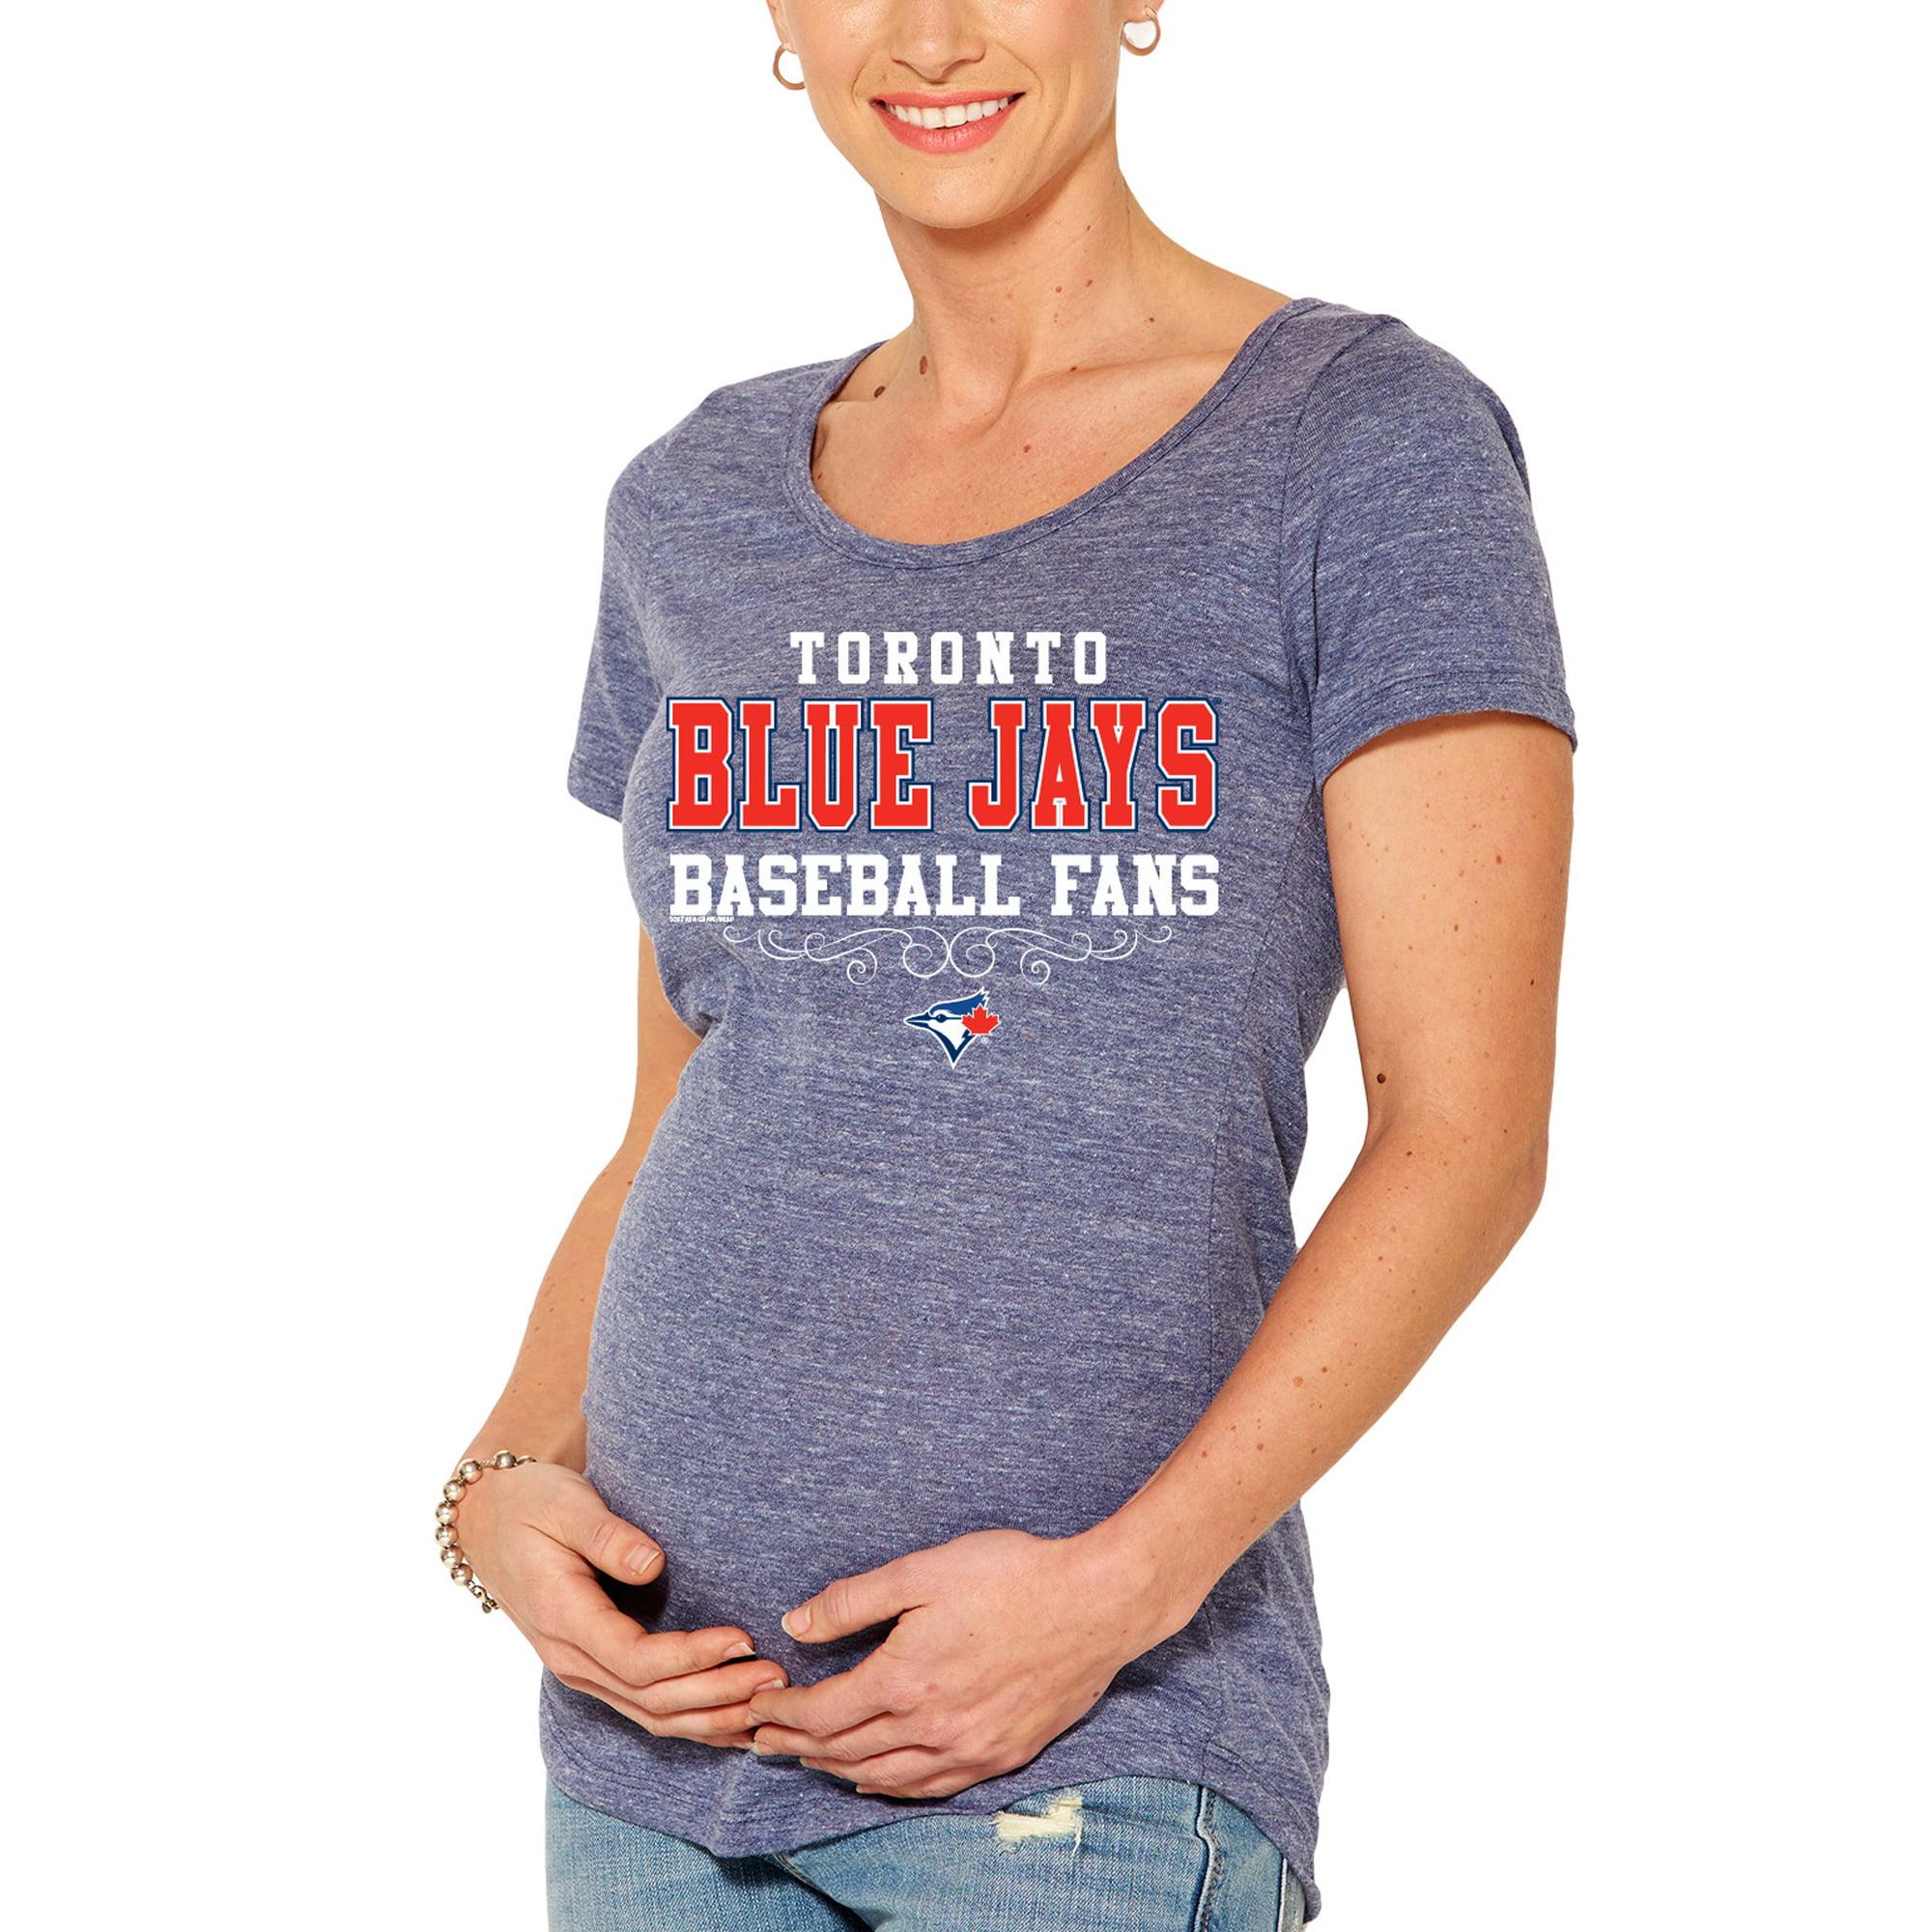 Toronto Blue Jays Soft As A Grape Women's Fans Tri-Blend Maternity T-Shirt - Royal